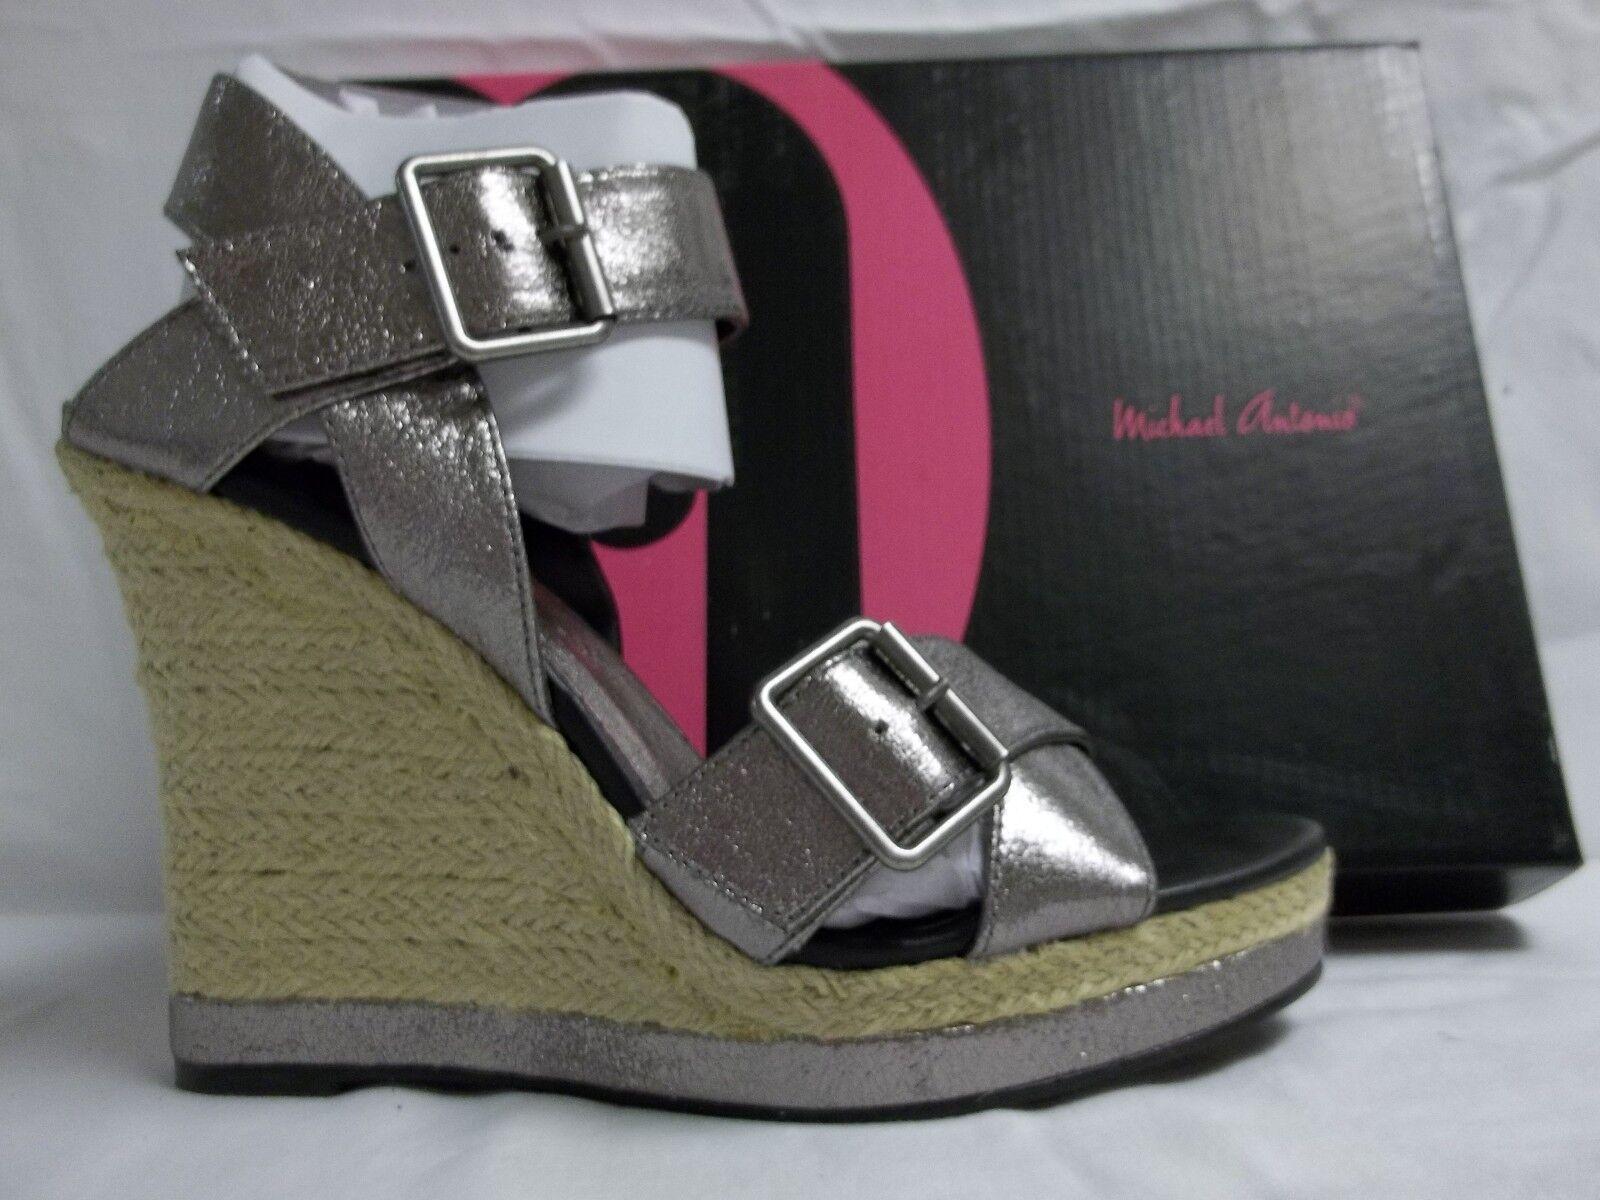 Michael Antonio Größe 9 M Gladwinn Pewter Schuhes Metallic Wedges New Damenschuhe Schuhes Pewter 759a81